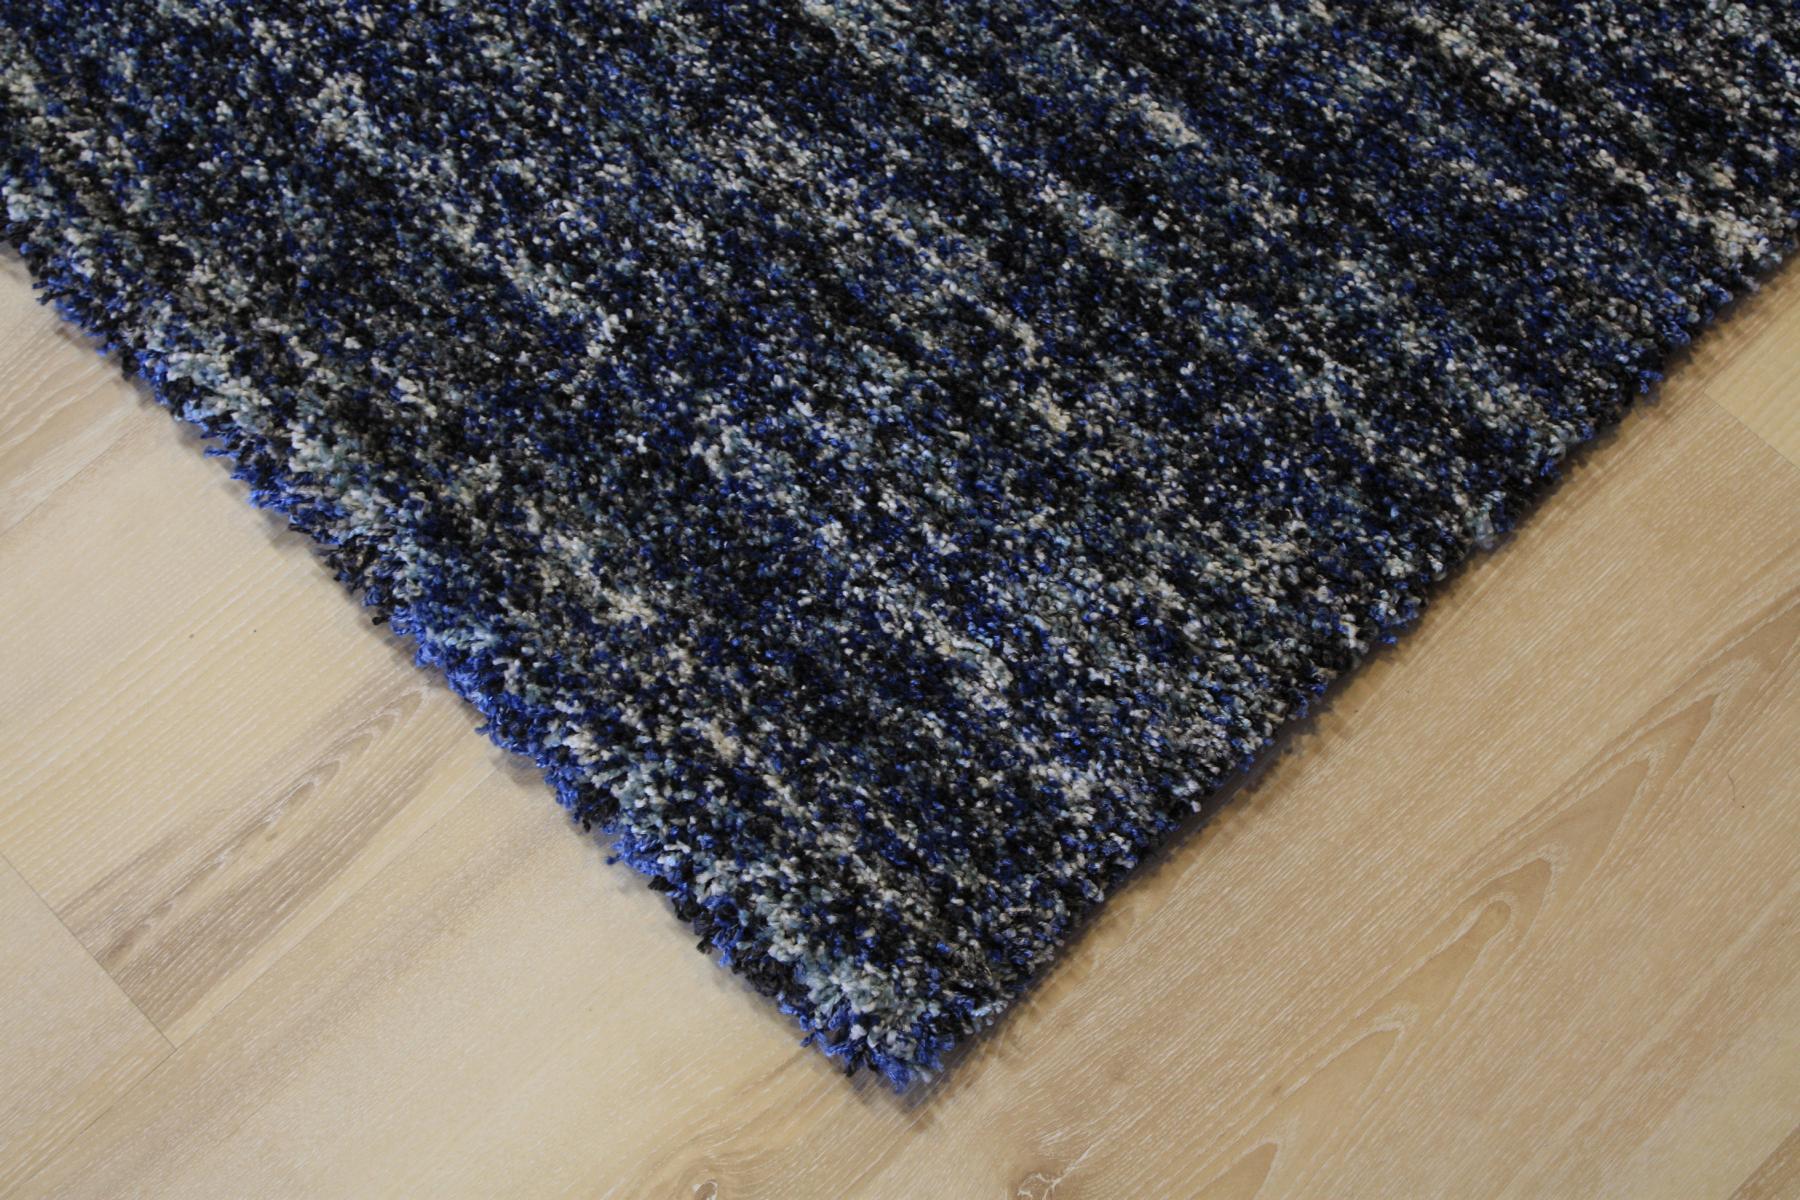 teppich mehari ragolle 23067 meliert 6141 blau 120x170 cm ebay. Black Bedroom Furniture Sets. Home Design Ideas